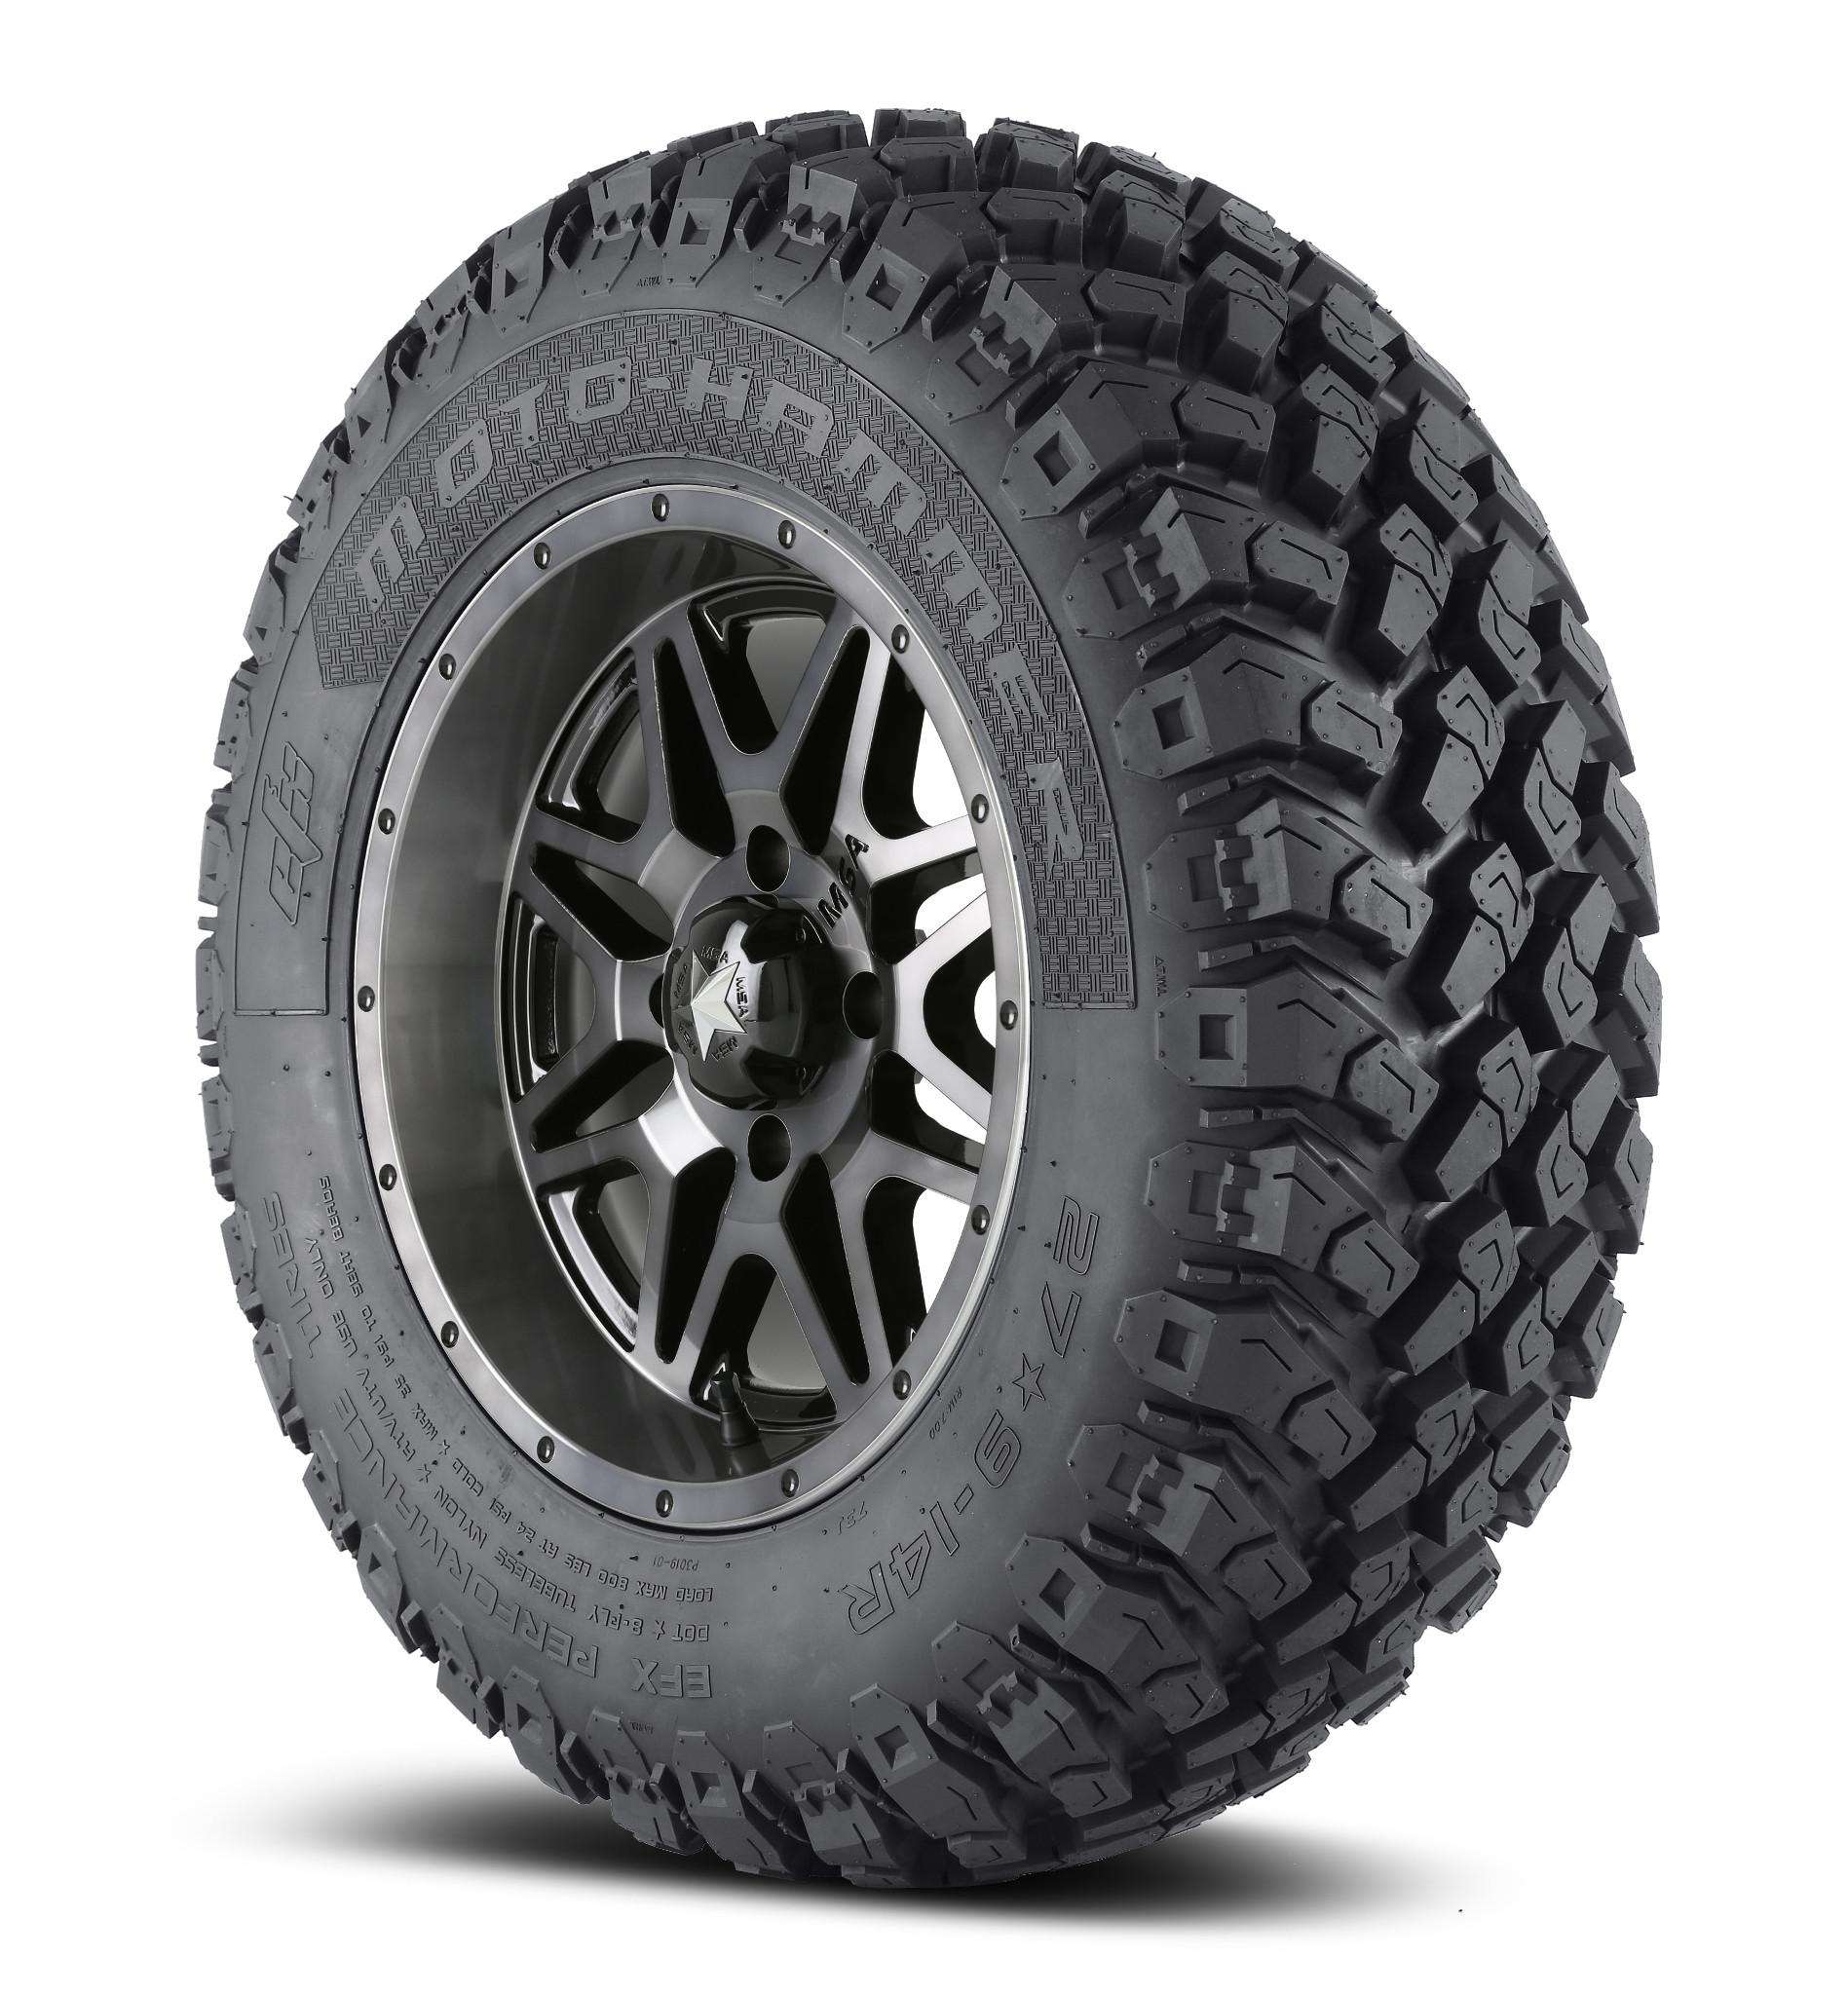 tire msa 14x7 moto wheel efx 31 m21 m26 vibe hammer dark kit inch utv tint beadlock tires wheels lok